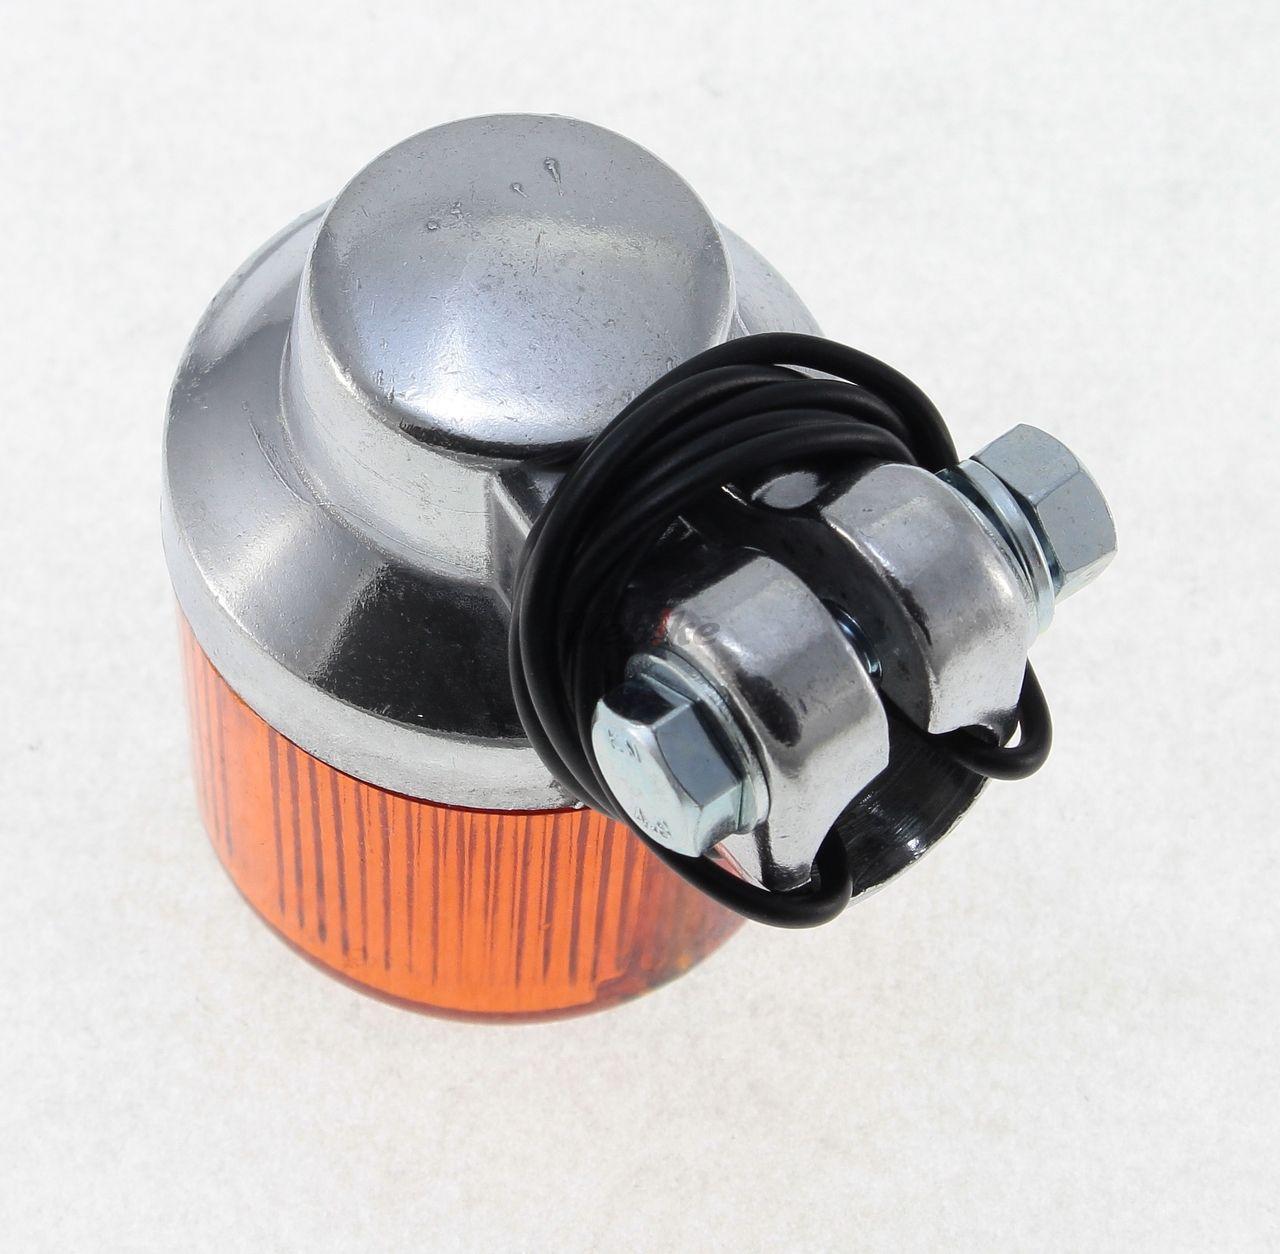 【PMC】European Type 45φ 方向燈 (透明/電鍍) - 「Webike-摩托百貨」